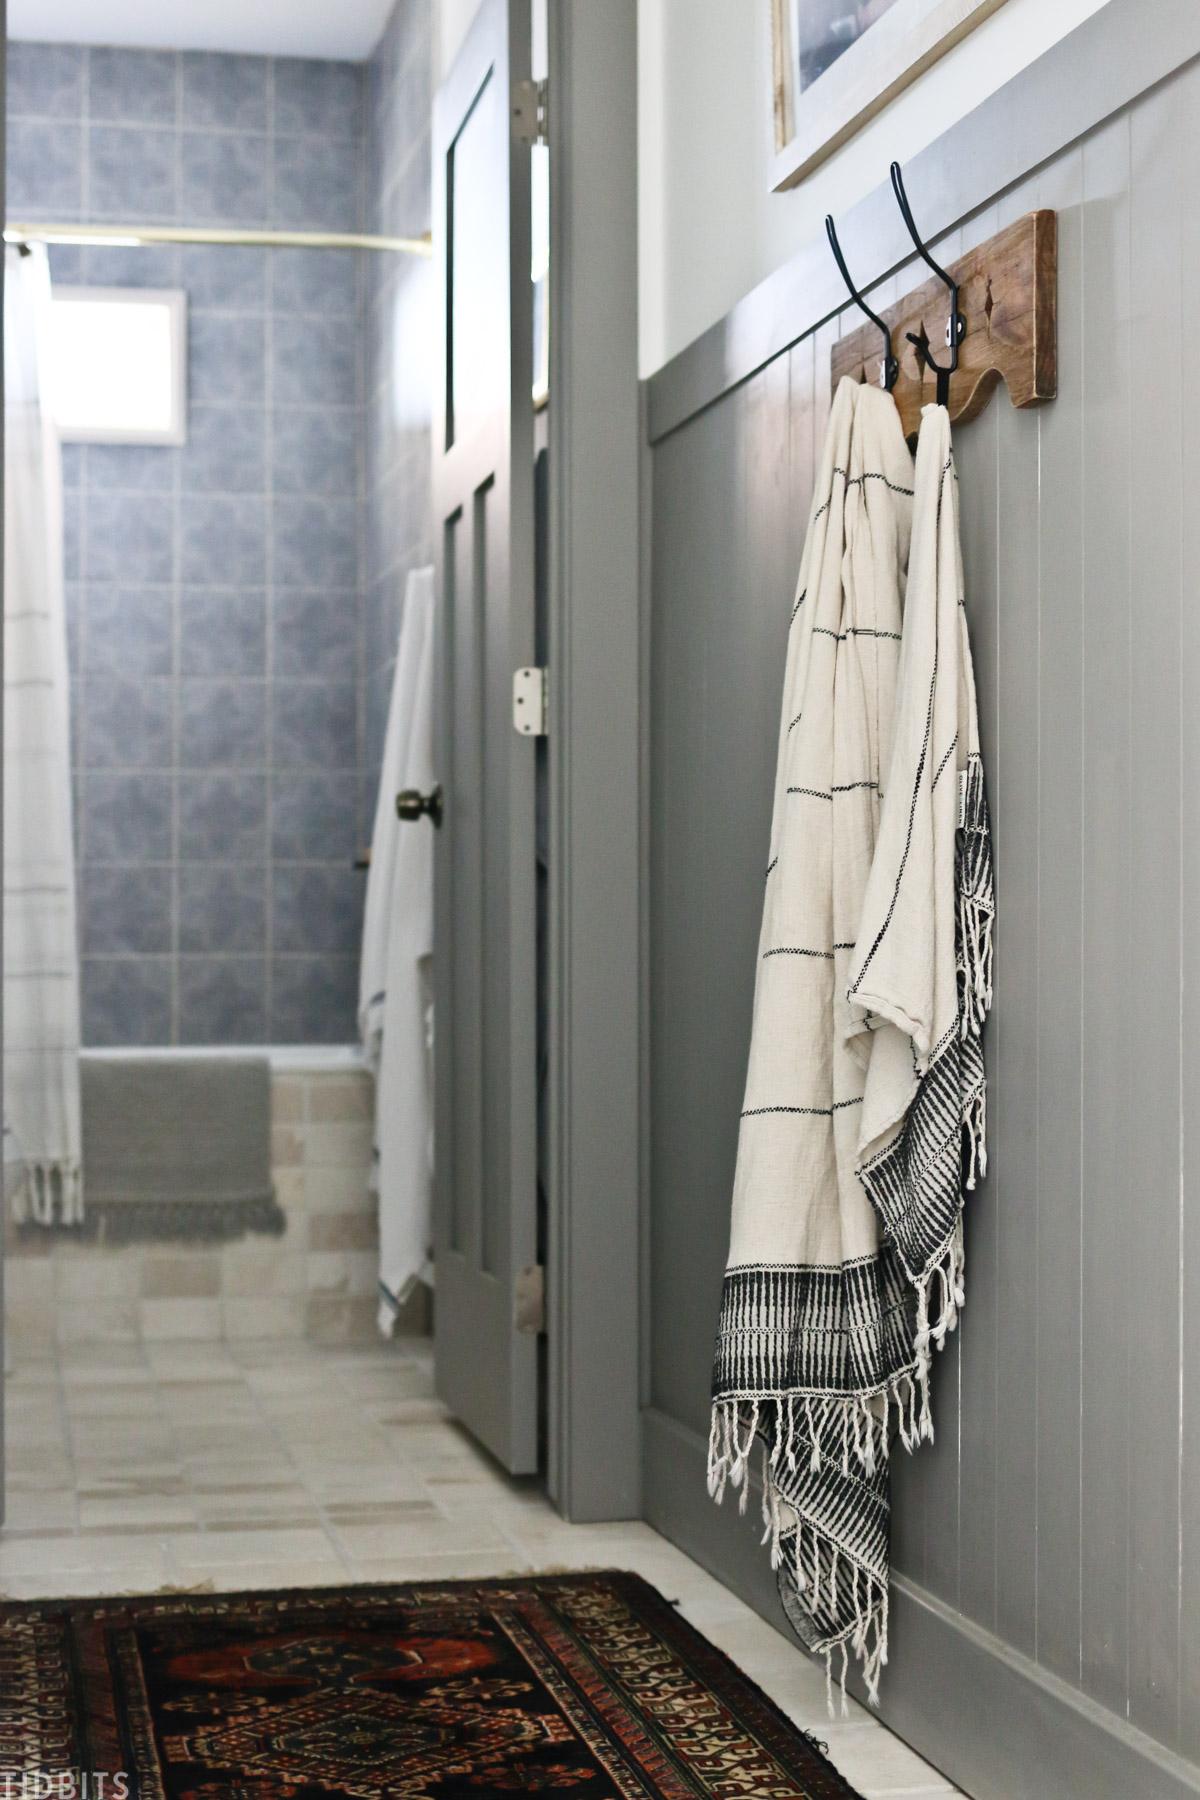 wooden towel rack with metal hooks hanging in split bathroom